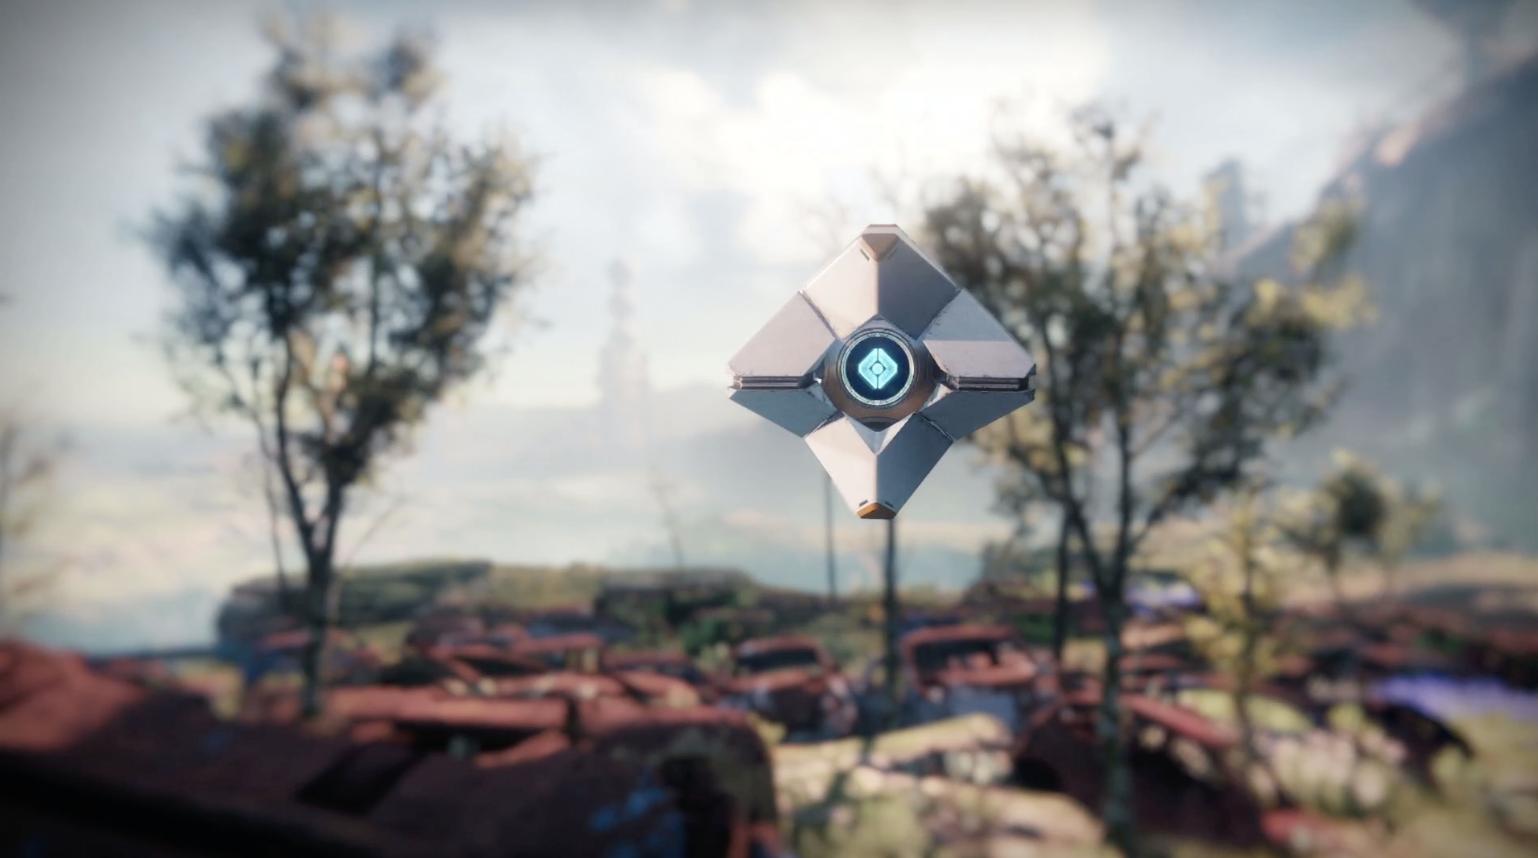 【Destiny 2】初心者でも安心できる要素が盛り沢山!序盤の進め方や攻略法を解説